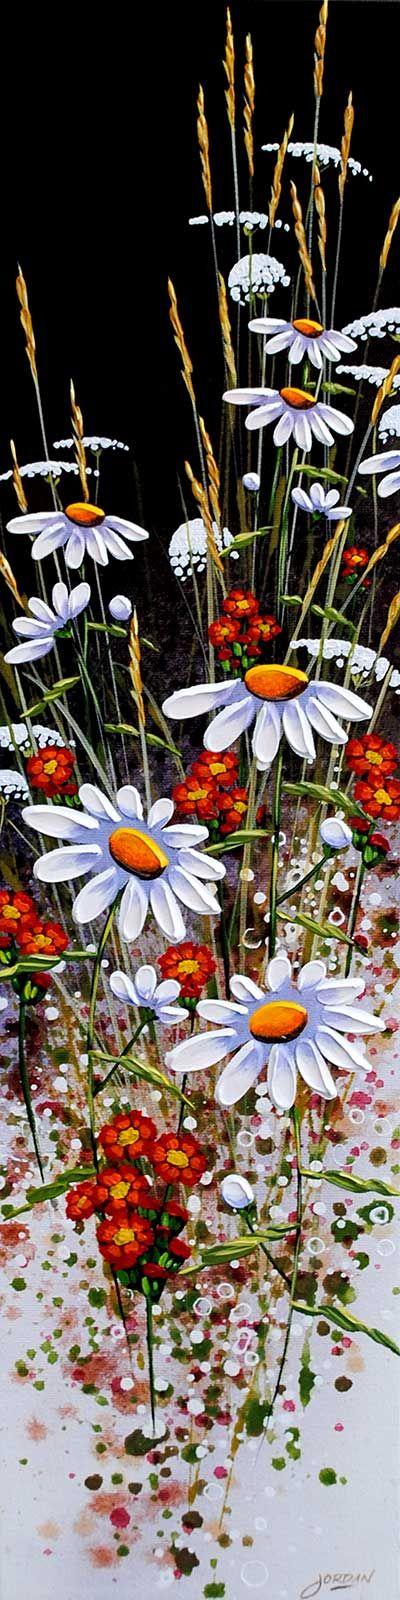 "Artist: Jordan Hicks Slender Spectacle Xxv - Ds acrylic on canvas, 24""h x 6""w  ♥•♥•♥"